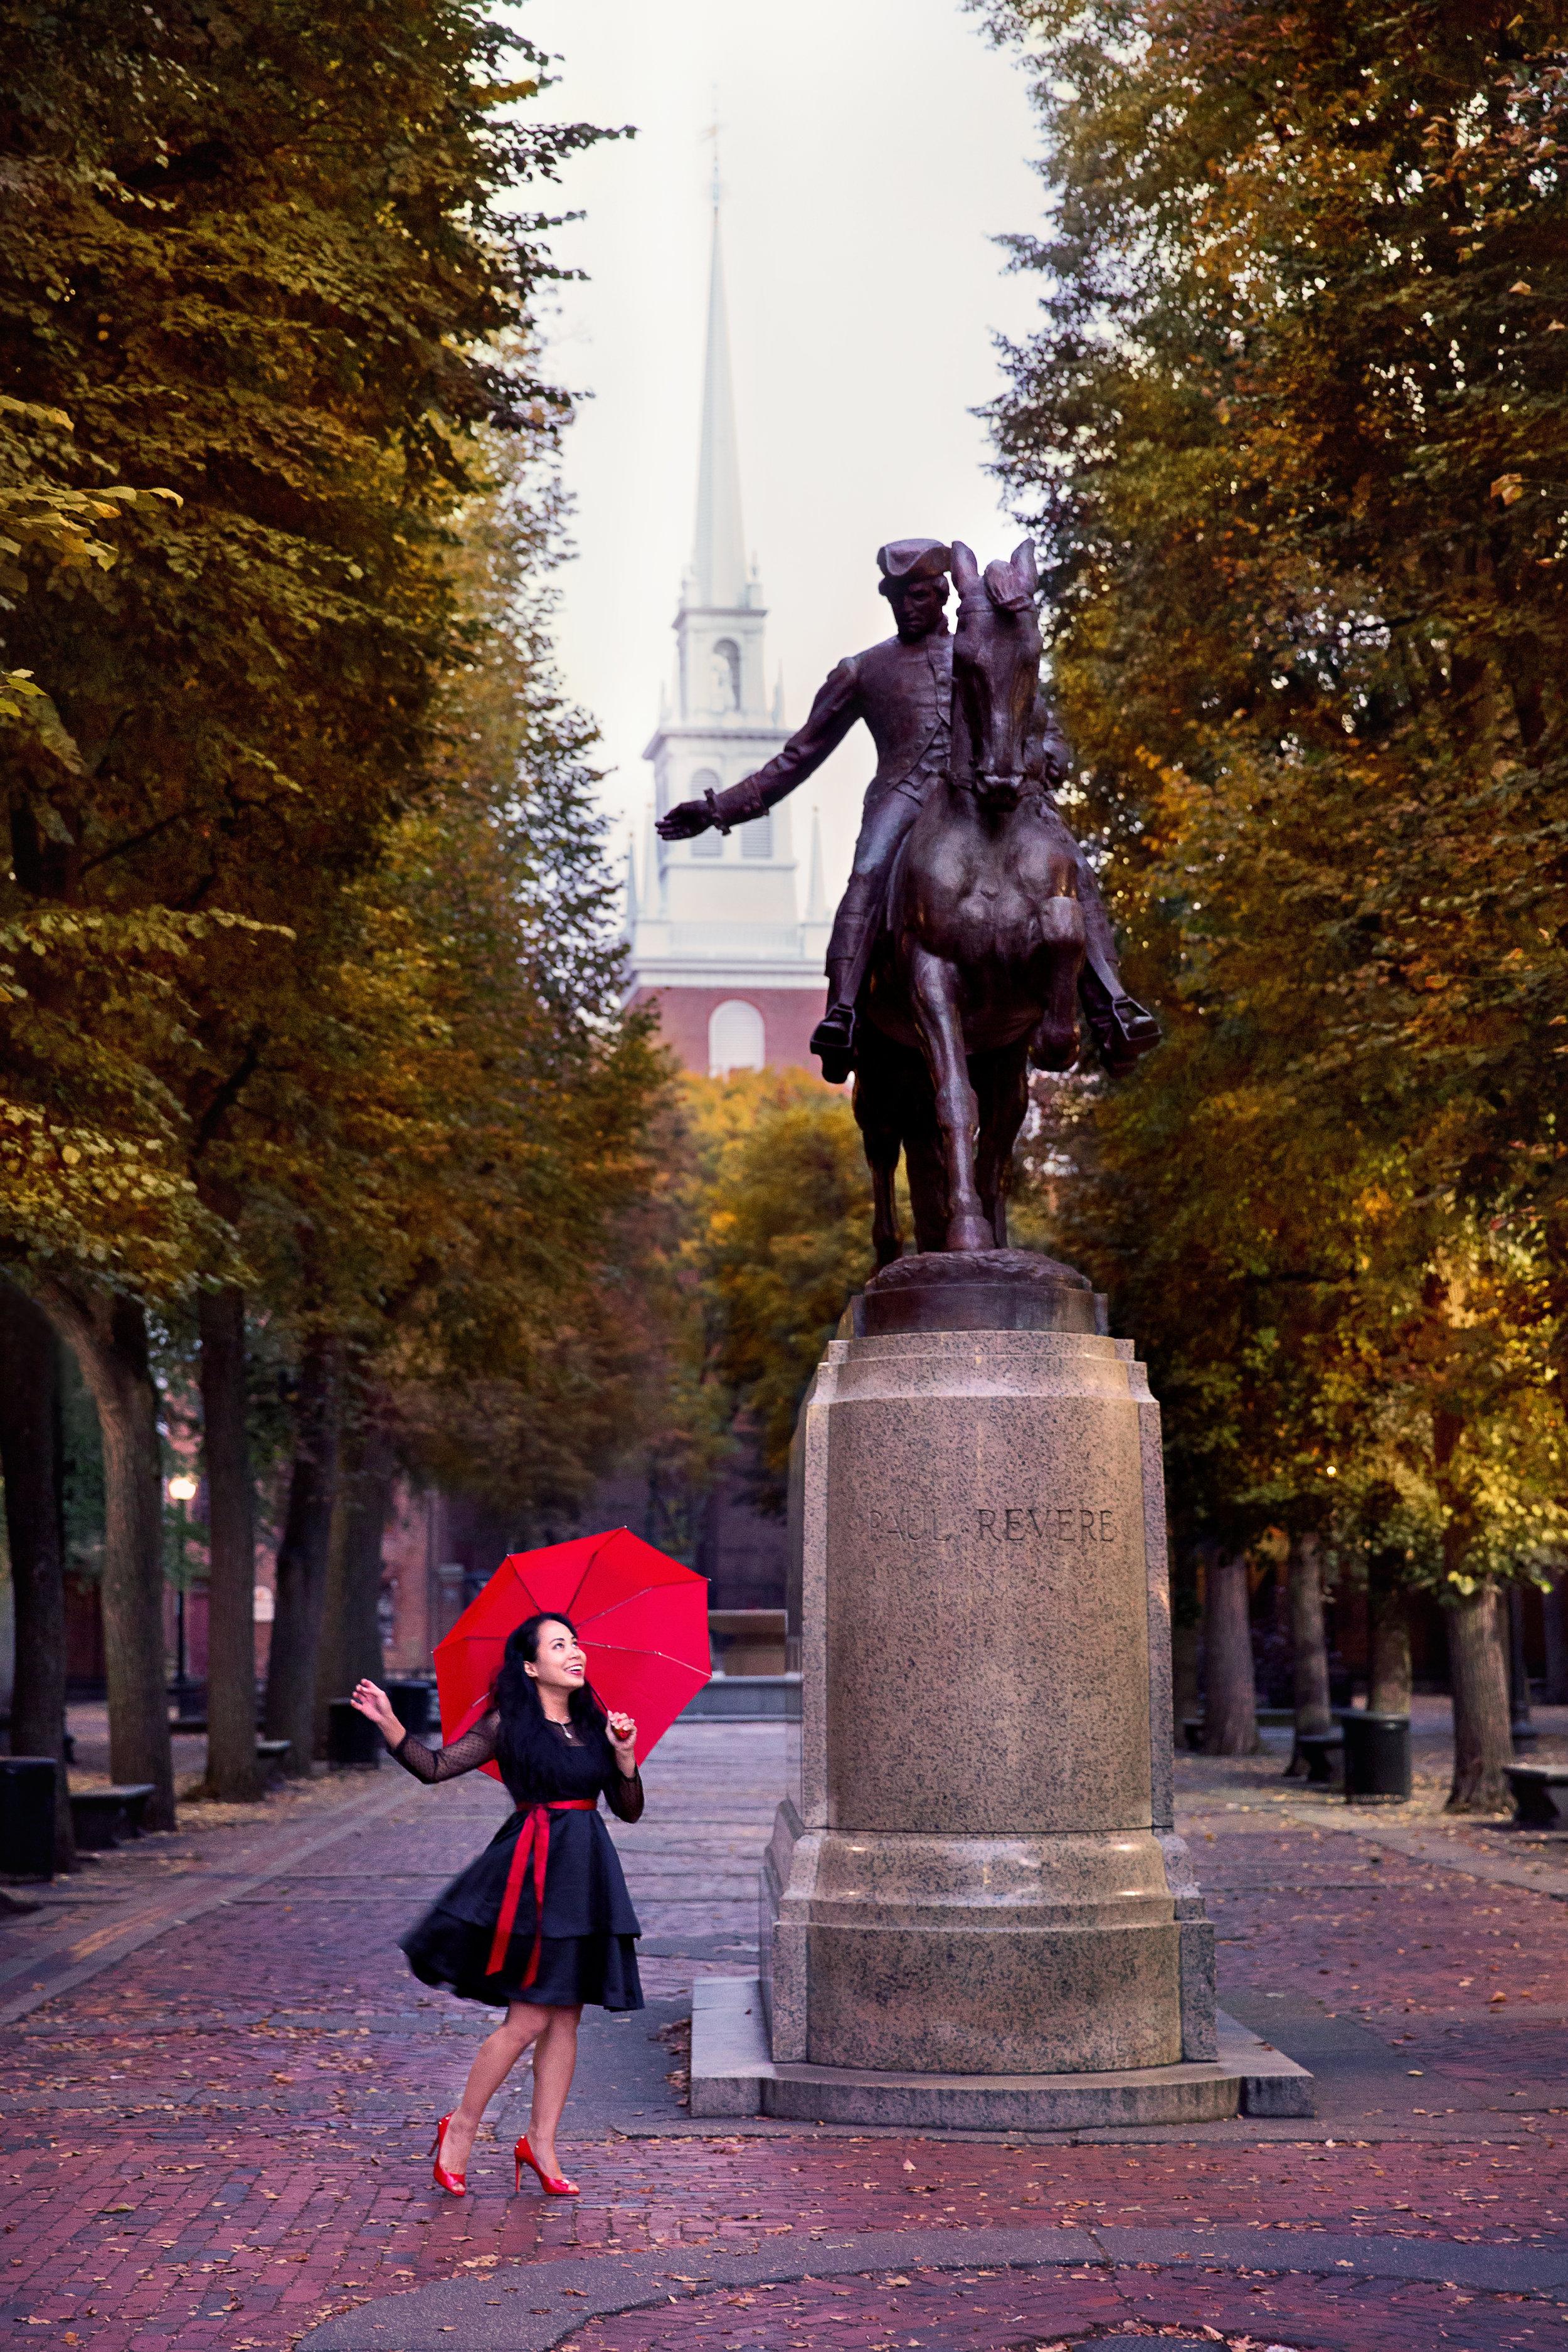 boston_landmark_2.jpg